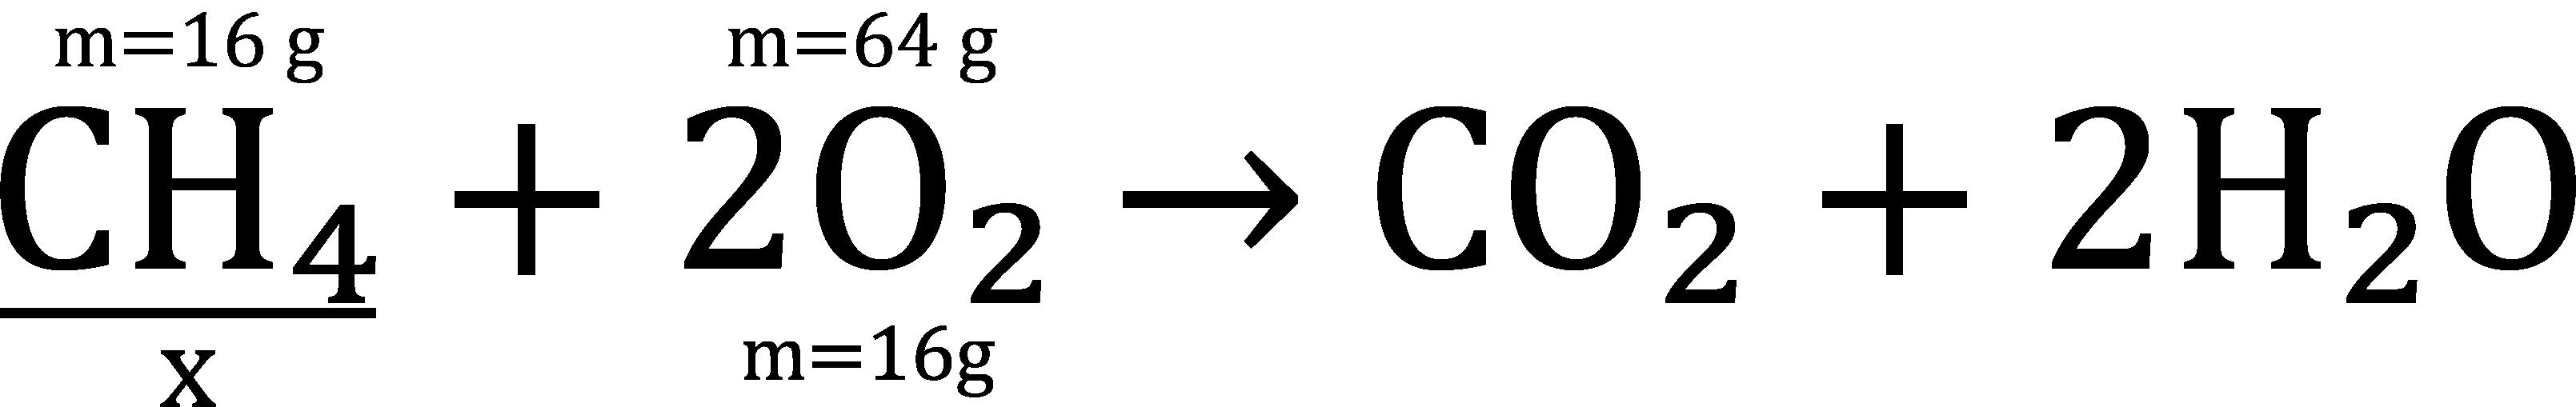 Etap 2.png